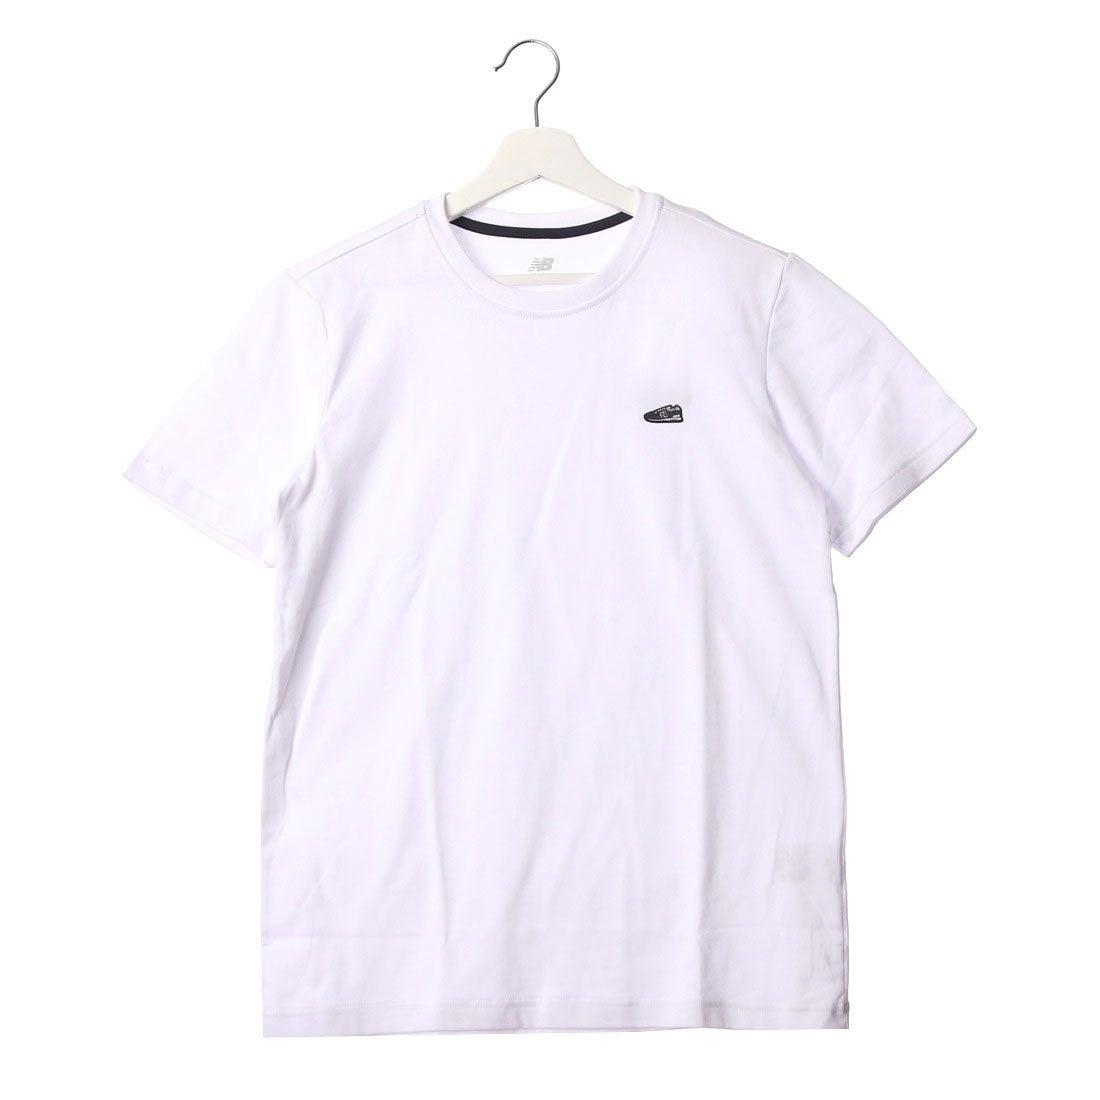 543af81a426ab new balance ニューバランス NEW BALANCE メンズ 半袖Tシャツ JMTL7209 JMTL7209 -レディースファッション通販  ロコンドガールズコレクション (ロココレ)